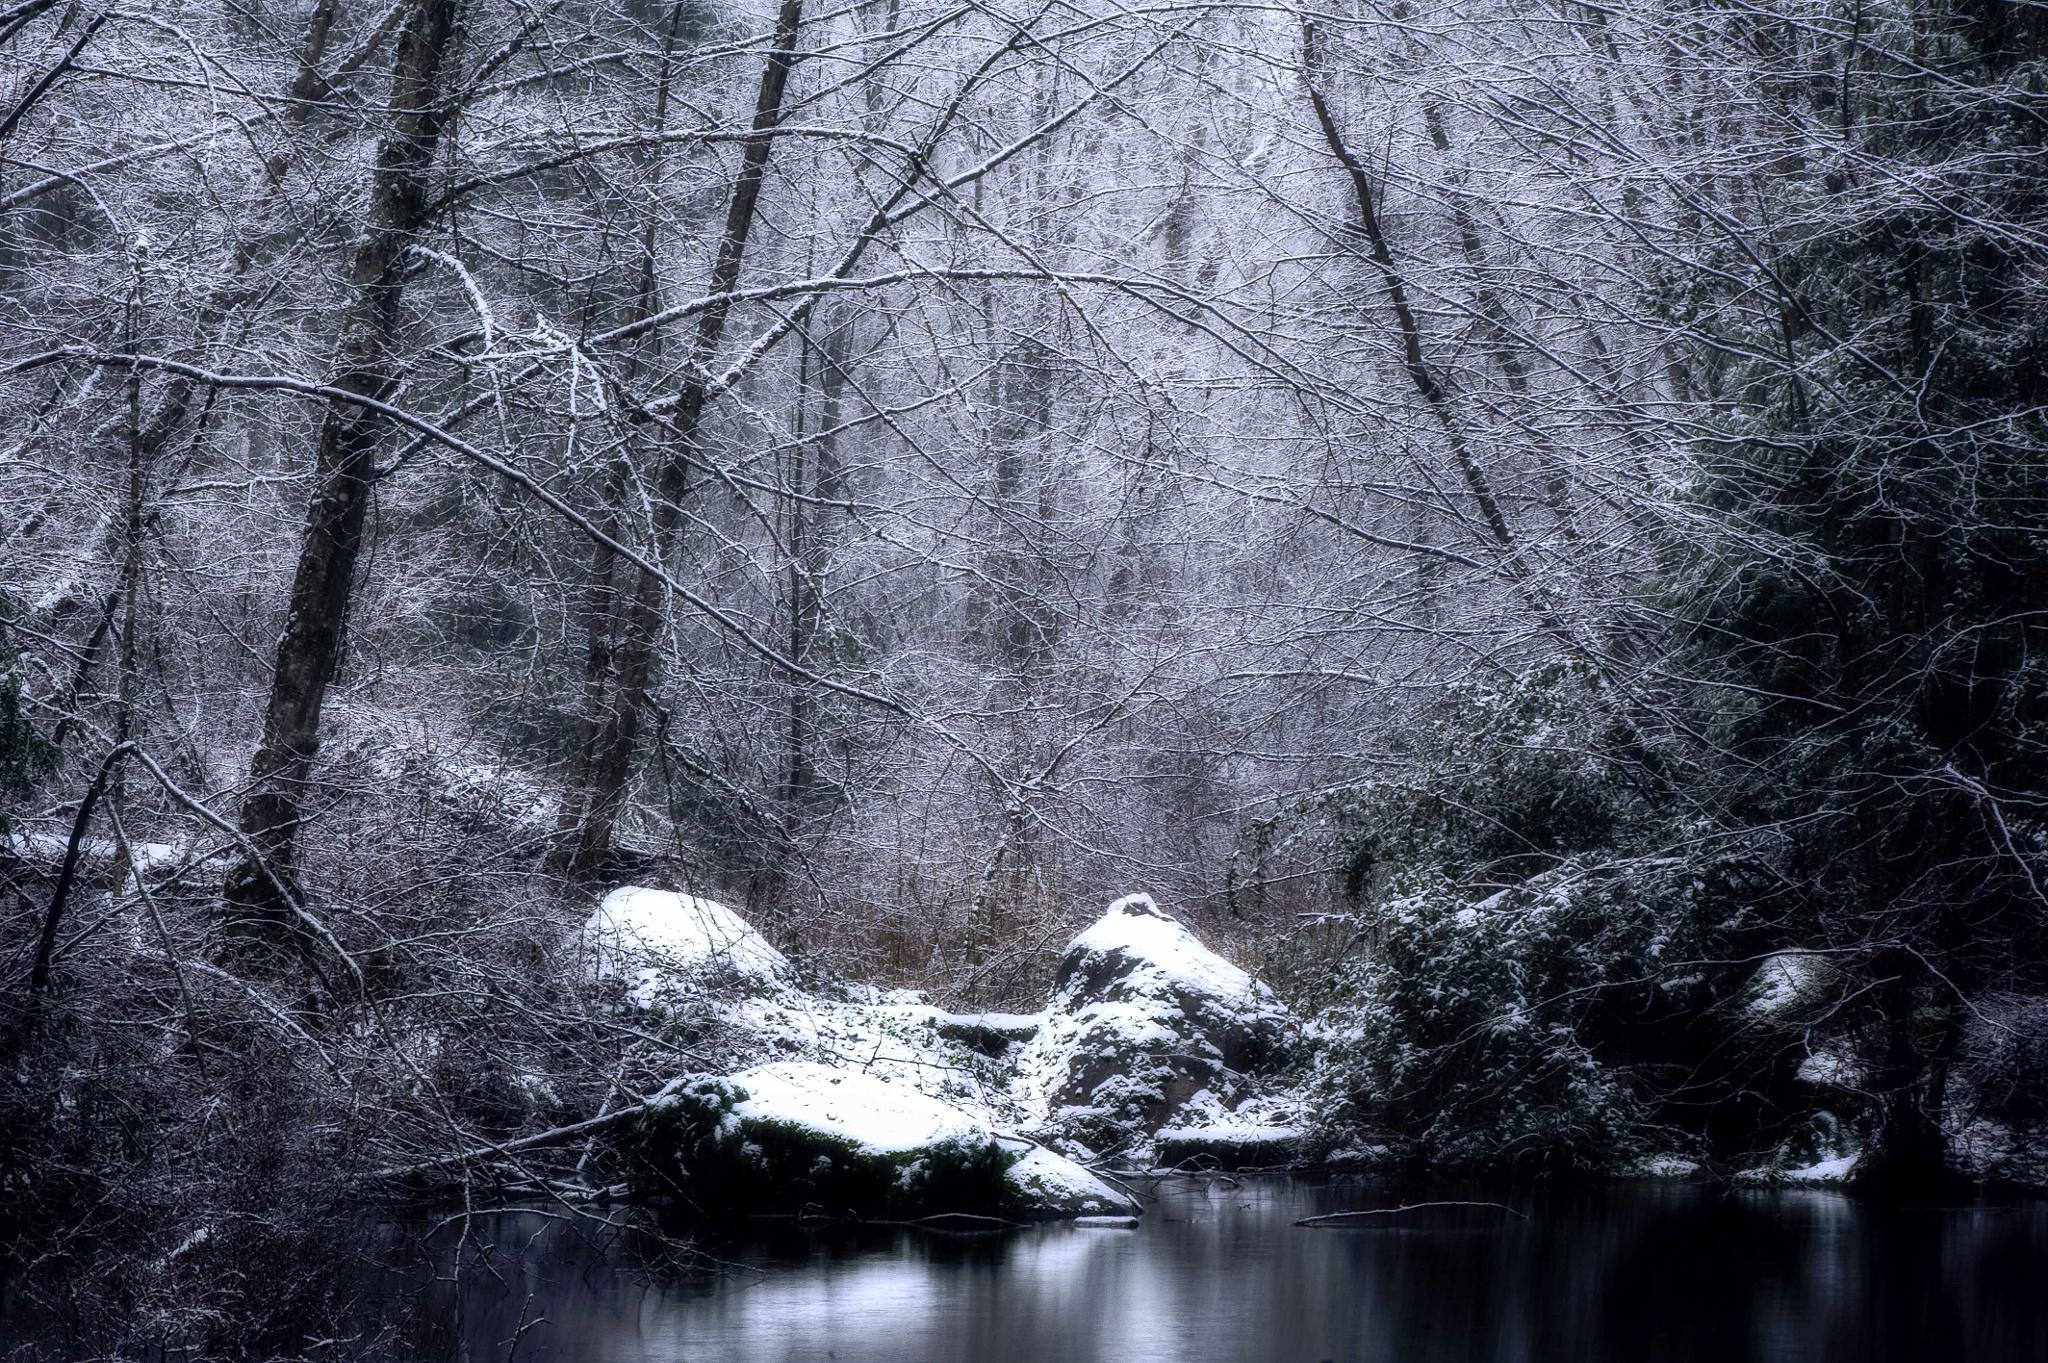 Ethereal Landscape - B&W by gldosa